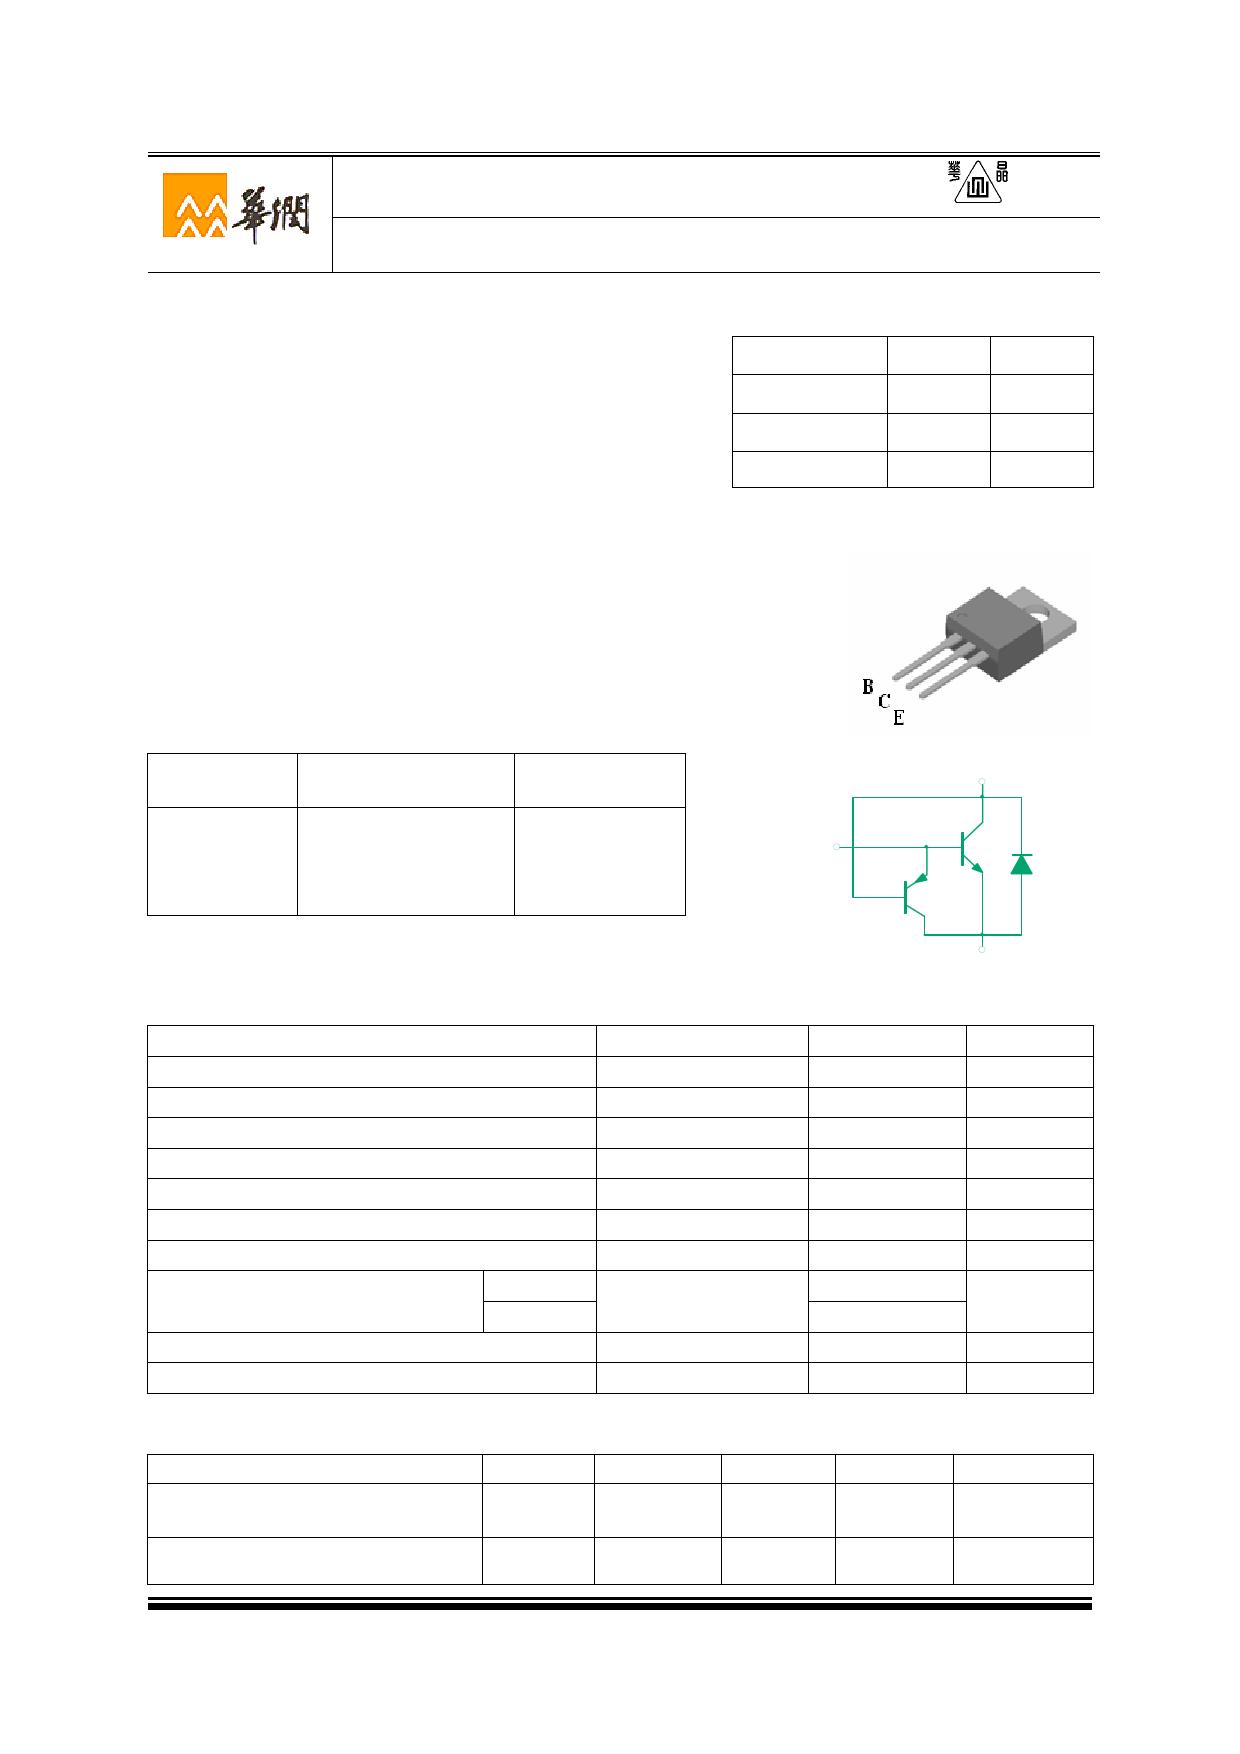 3DD13003J8D Datasheet, 3DD13003J8D PDF,ピン配置, 機能